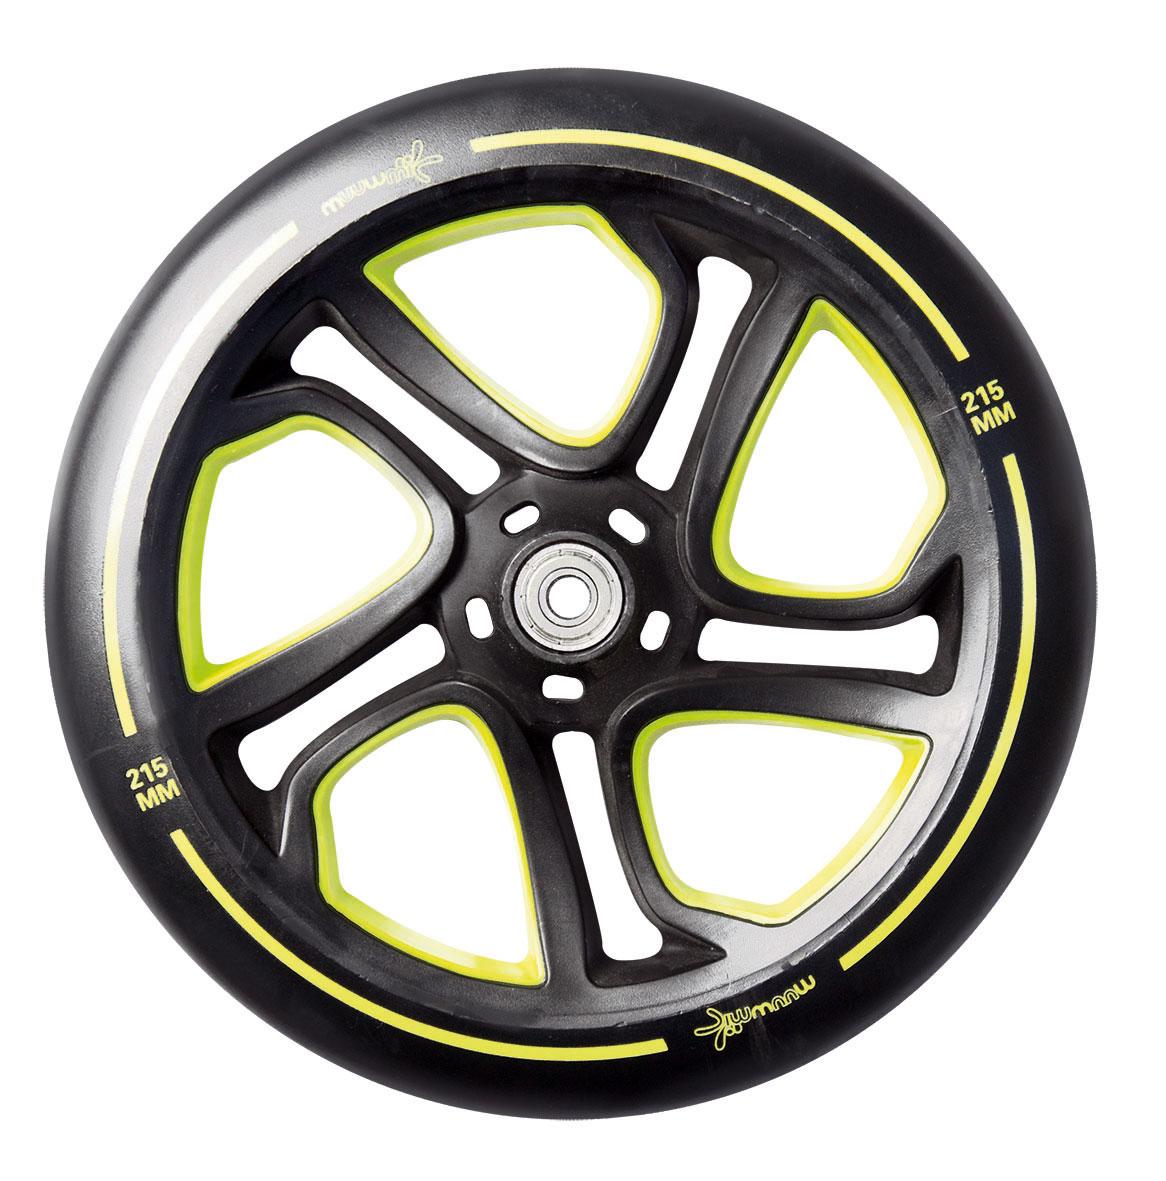 Alu Scooter / Cityroller Muuwmi Pro 215 mm lime-grün Bild 3